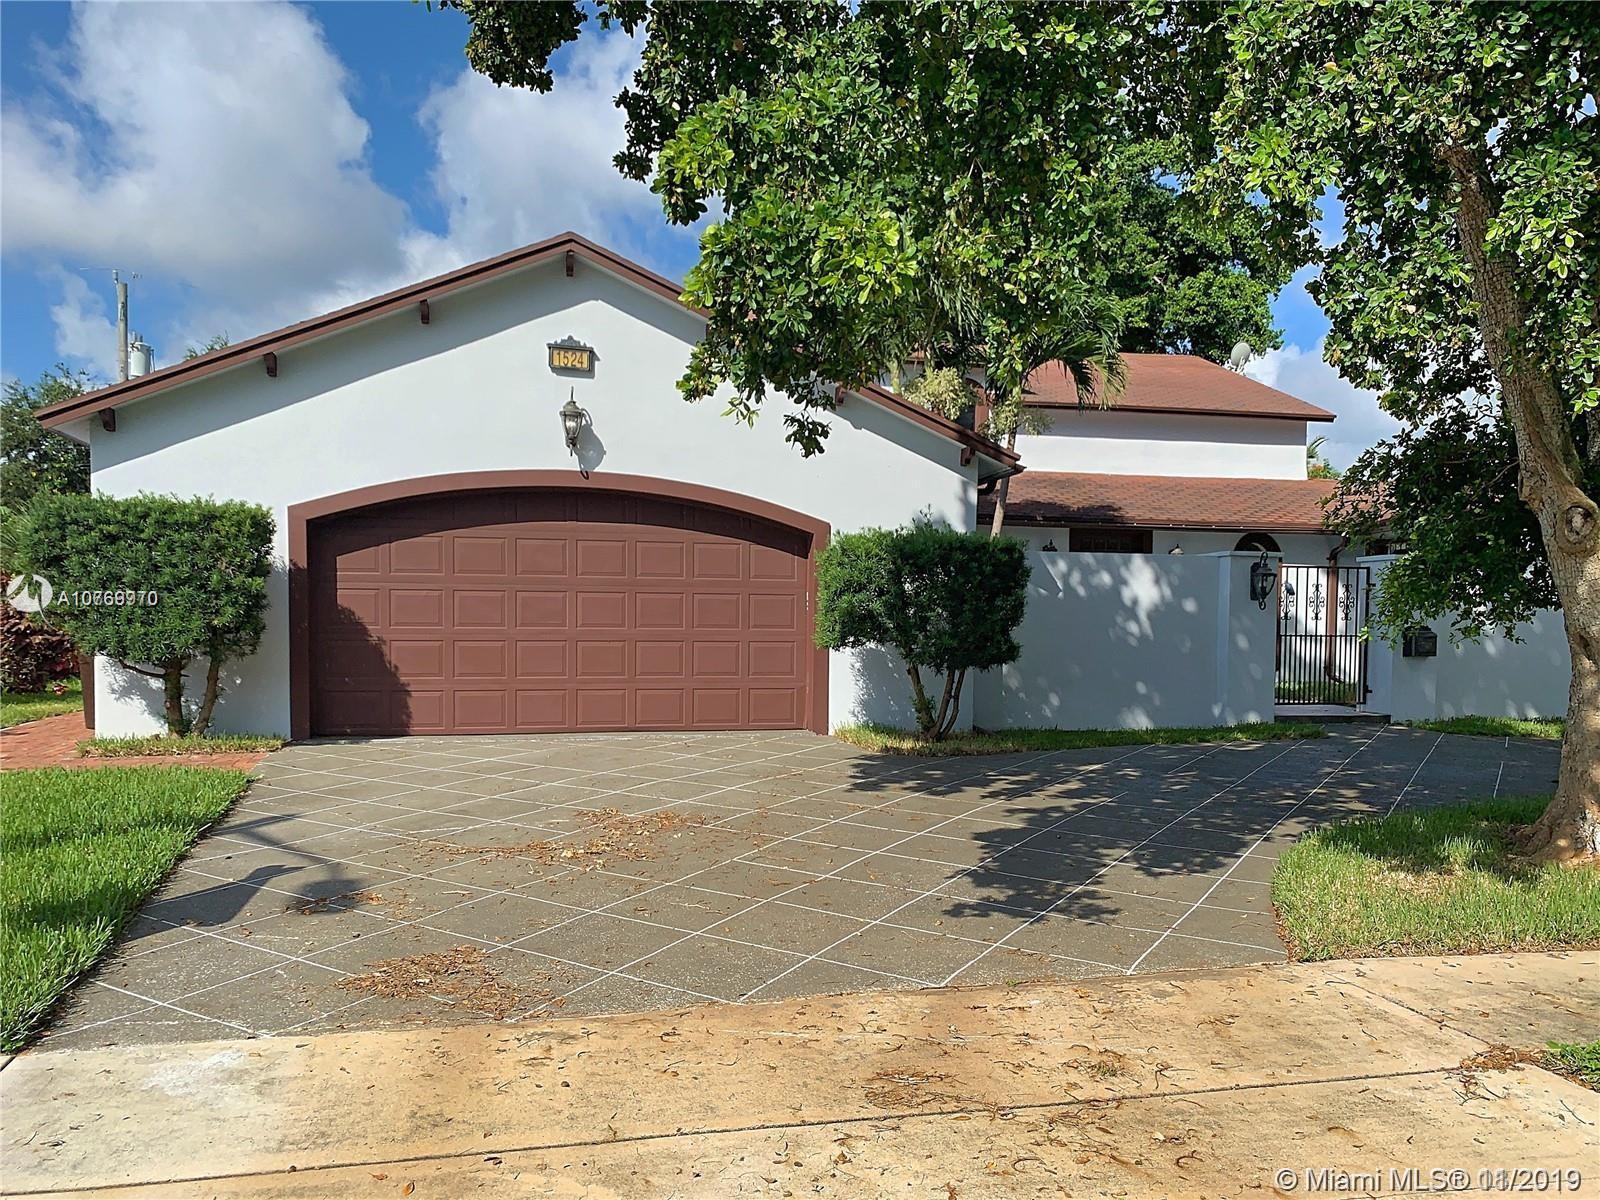 1524 39th St, West Palm Beach, FL 33407